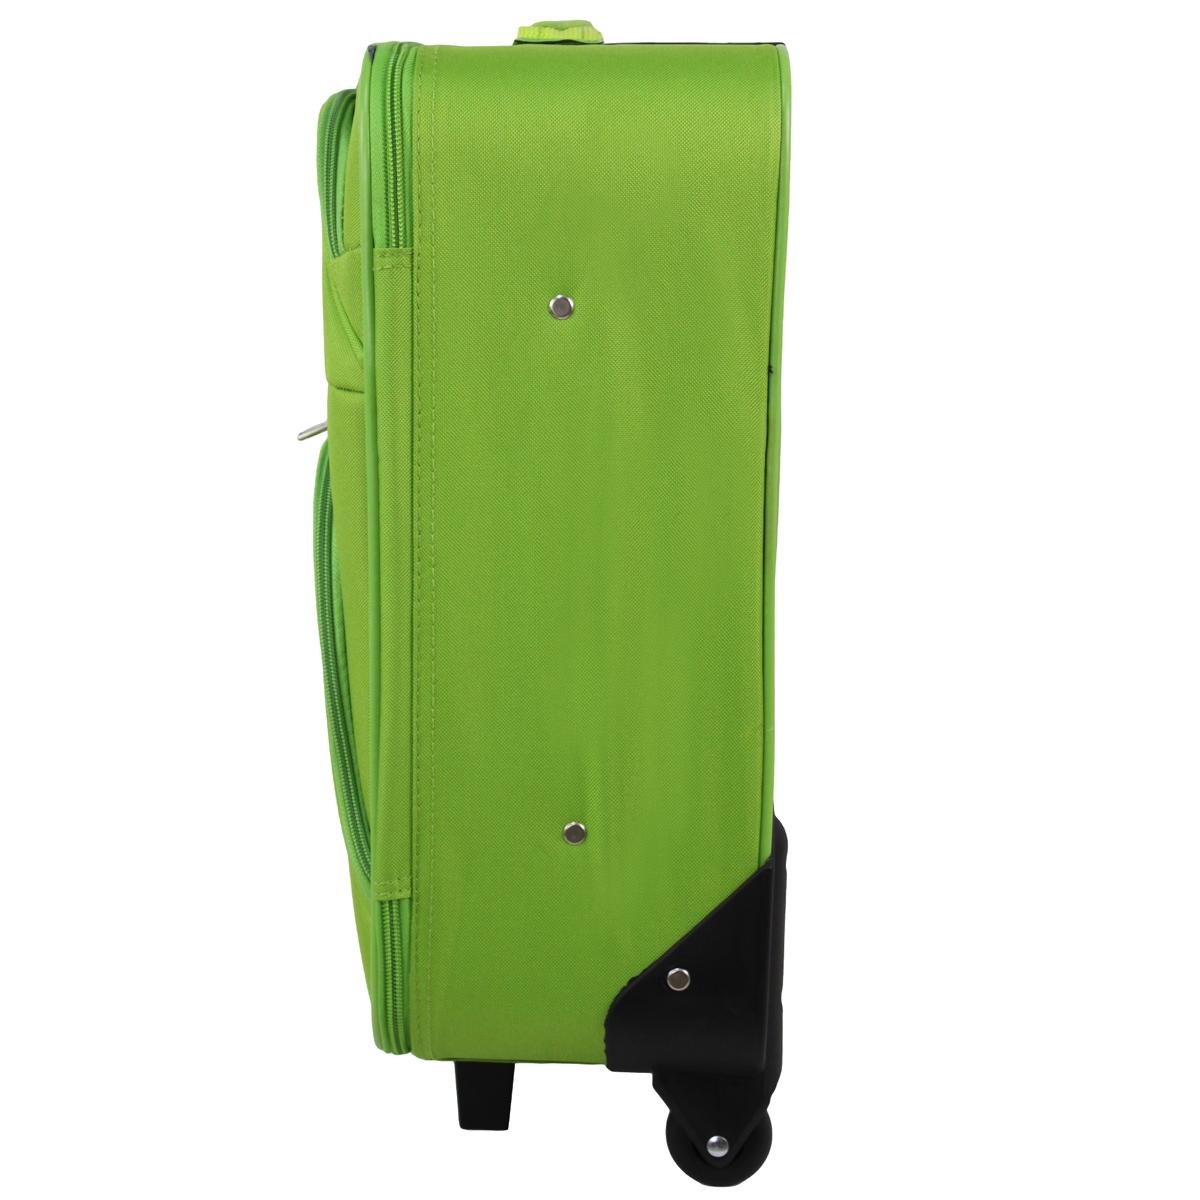 valise cabine pas cher achat bagage souple. Black Bedroom Furniture Sets. Home Design Ideas